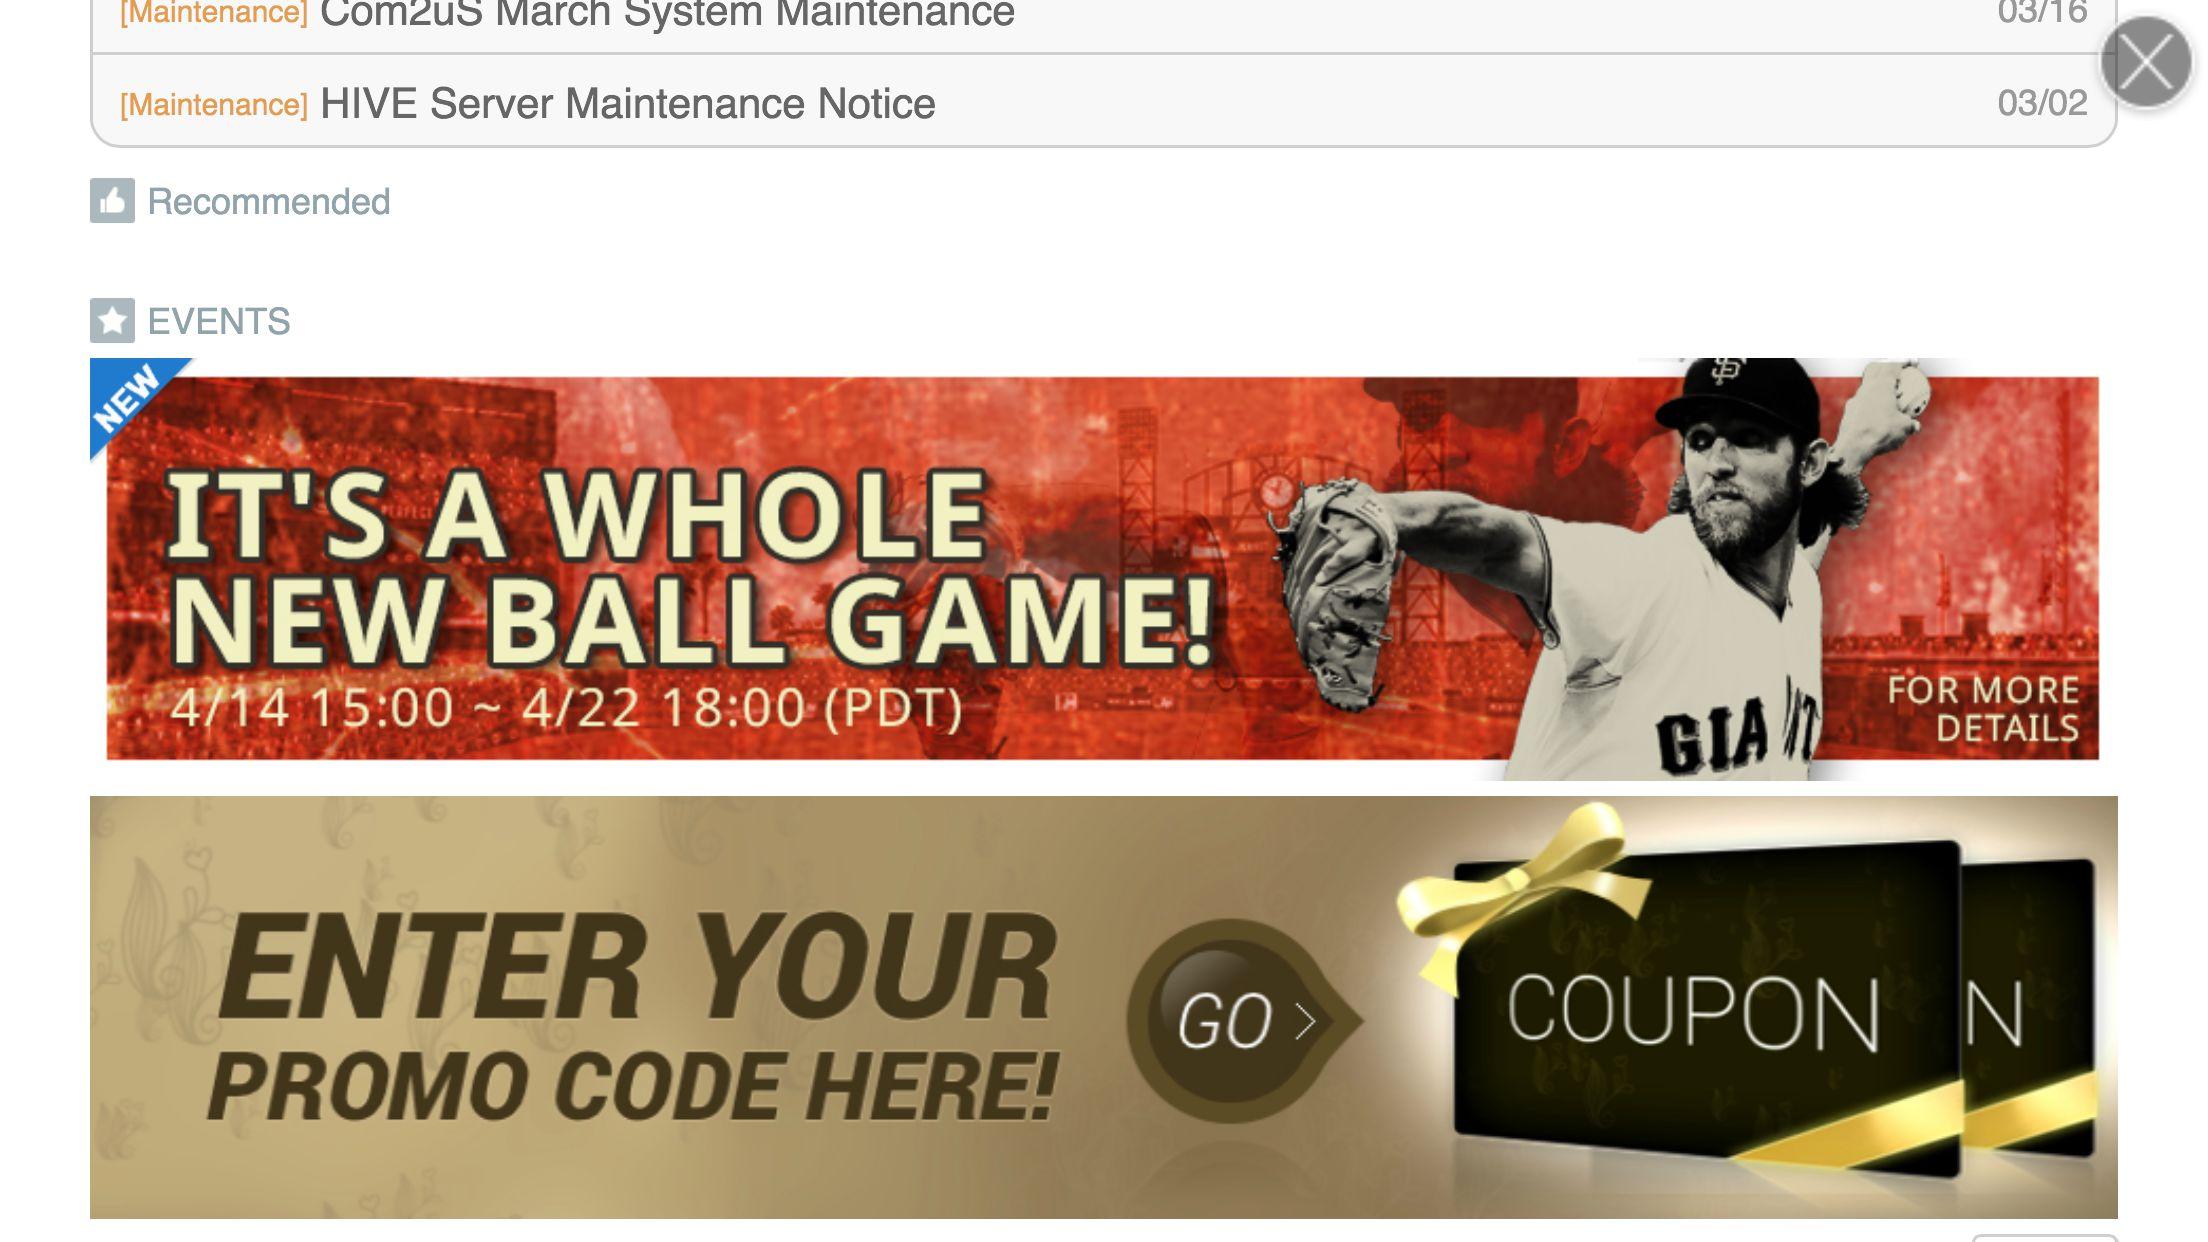 Mlb.com coupon code